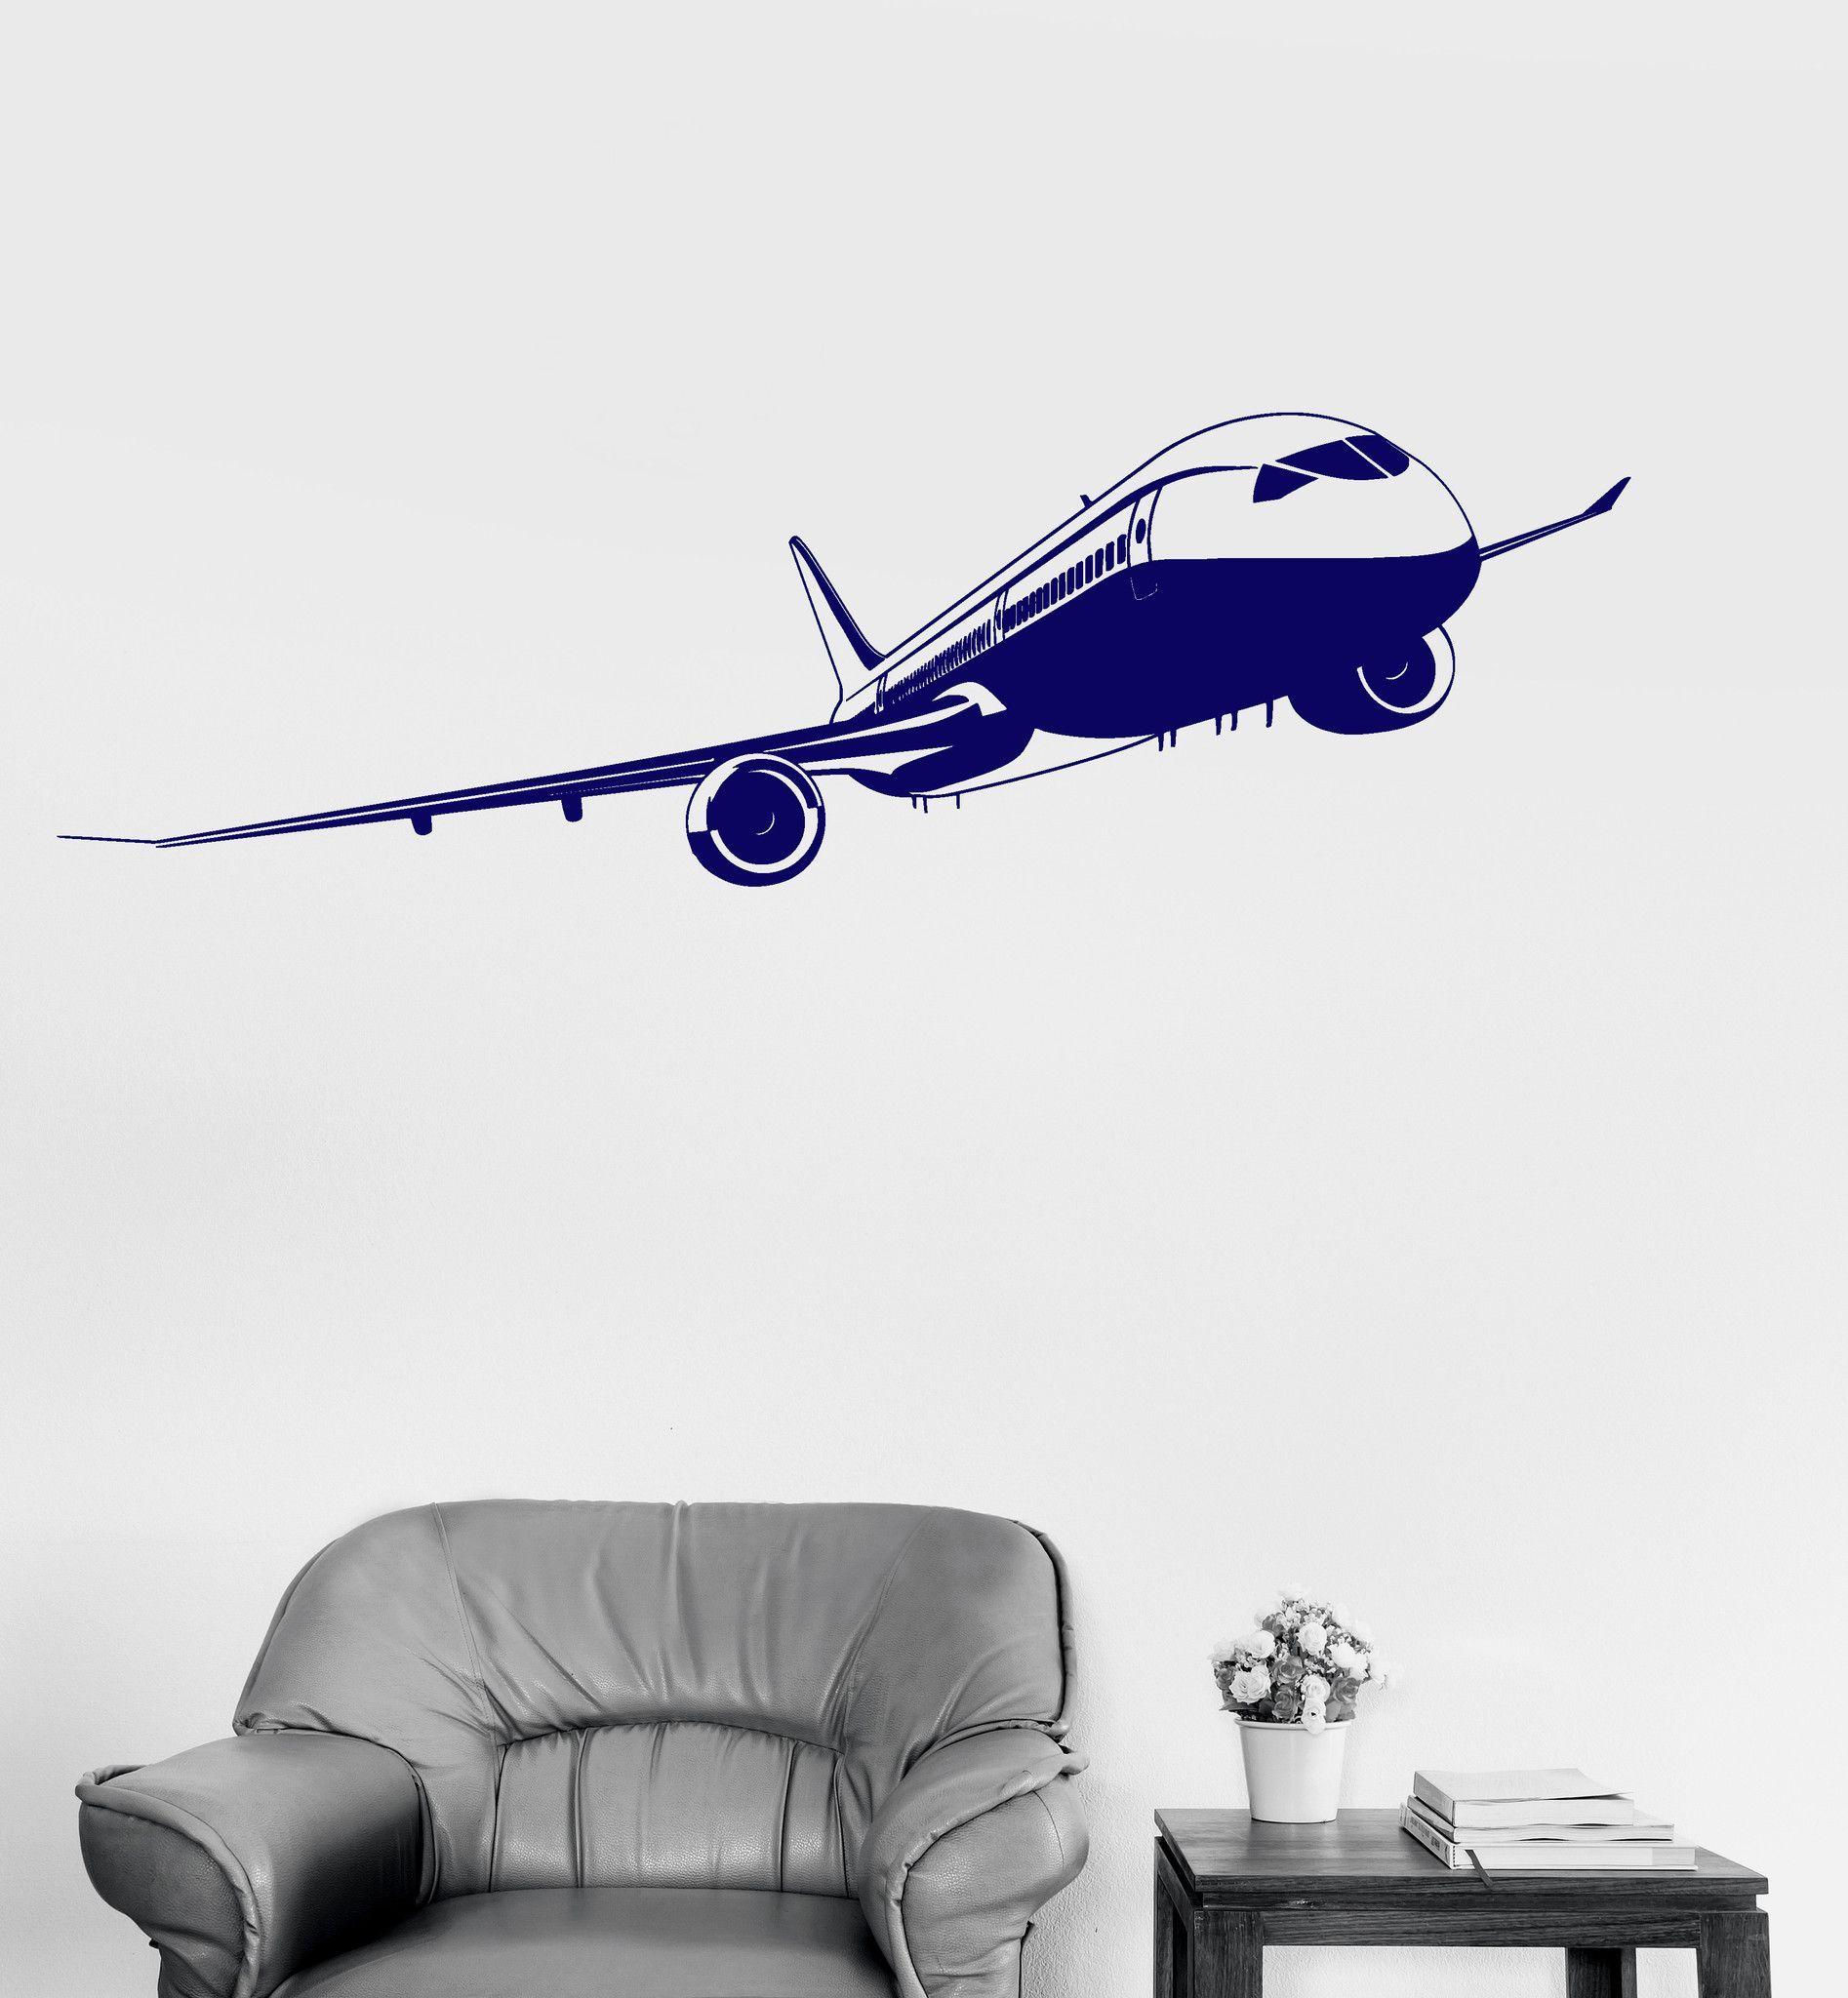 Vinyl Wall Decal Aviation Aircraft Airport Kids Room Art Stickers Ig3206 Aviationfurniture Vinyl Wall Decals Sticker Art Kids Room Art [ 2048 x 1894 Pixel ]